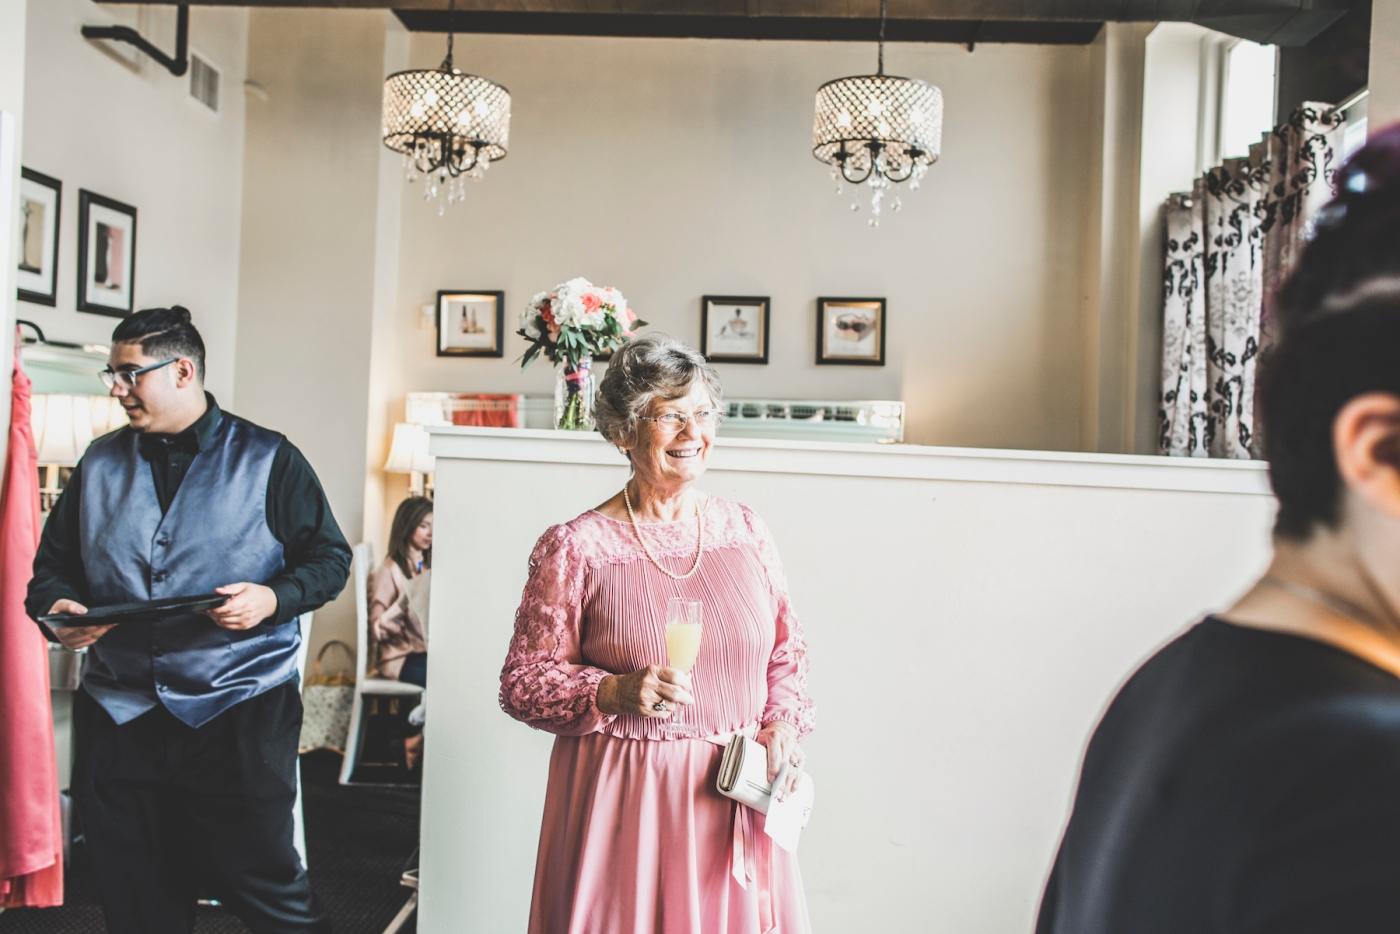 DSC_1807Everett_Wedding_Ballroom_Jane_Speleers_photography_Rachel_and_Edmund_Getting_ready_2017